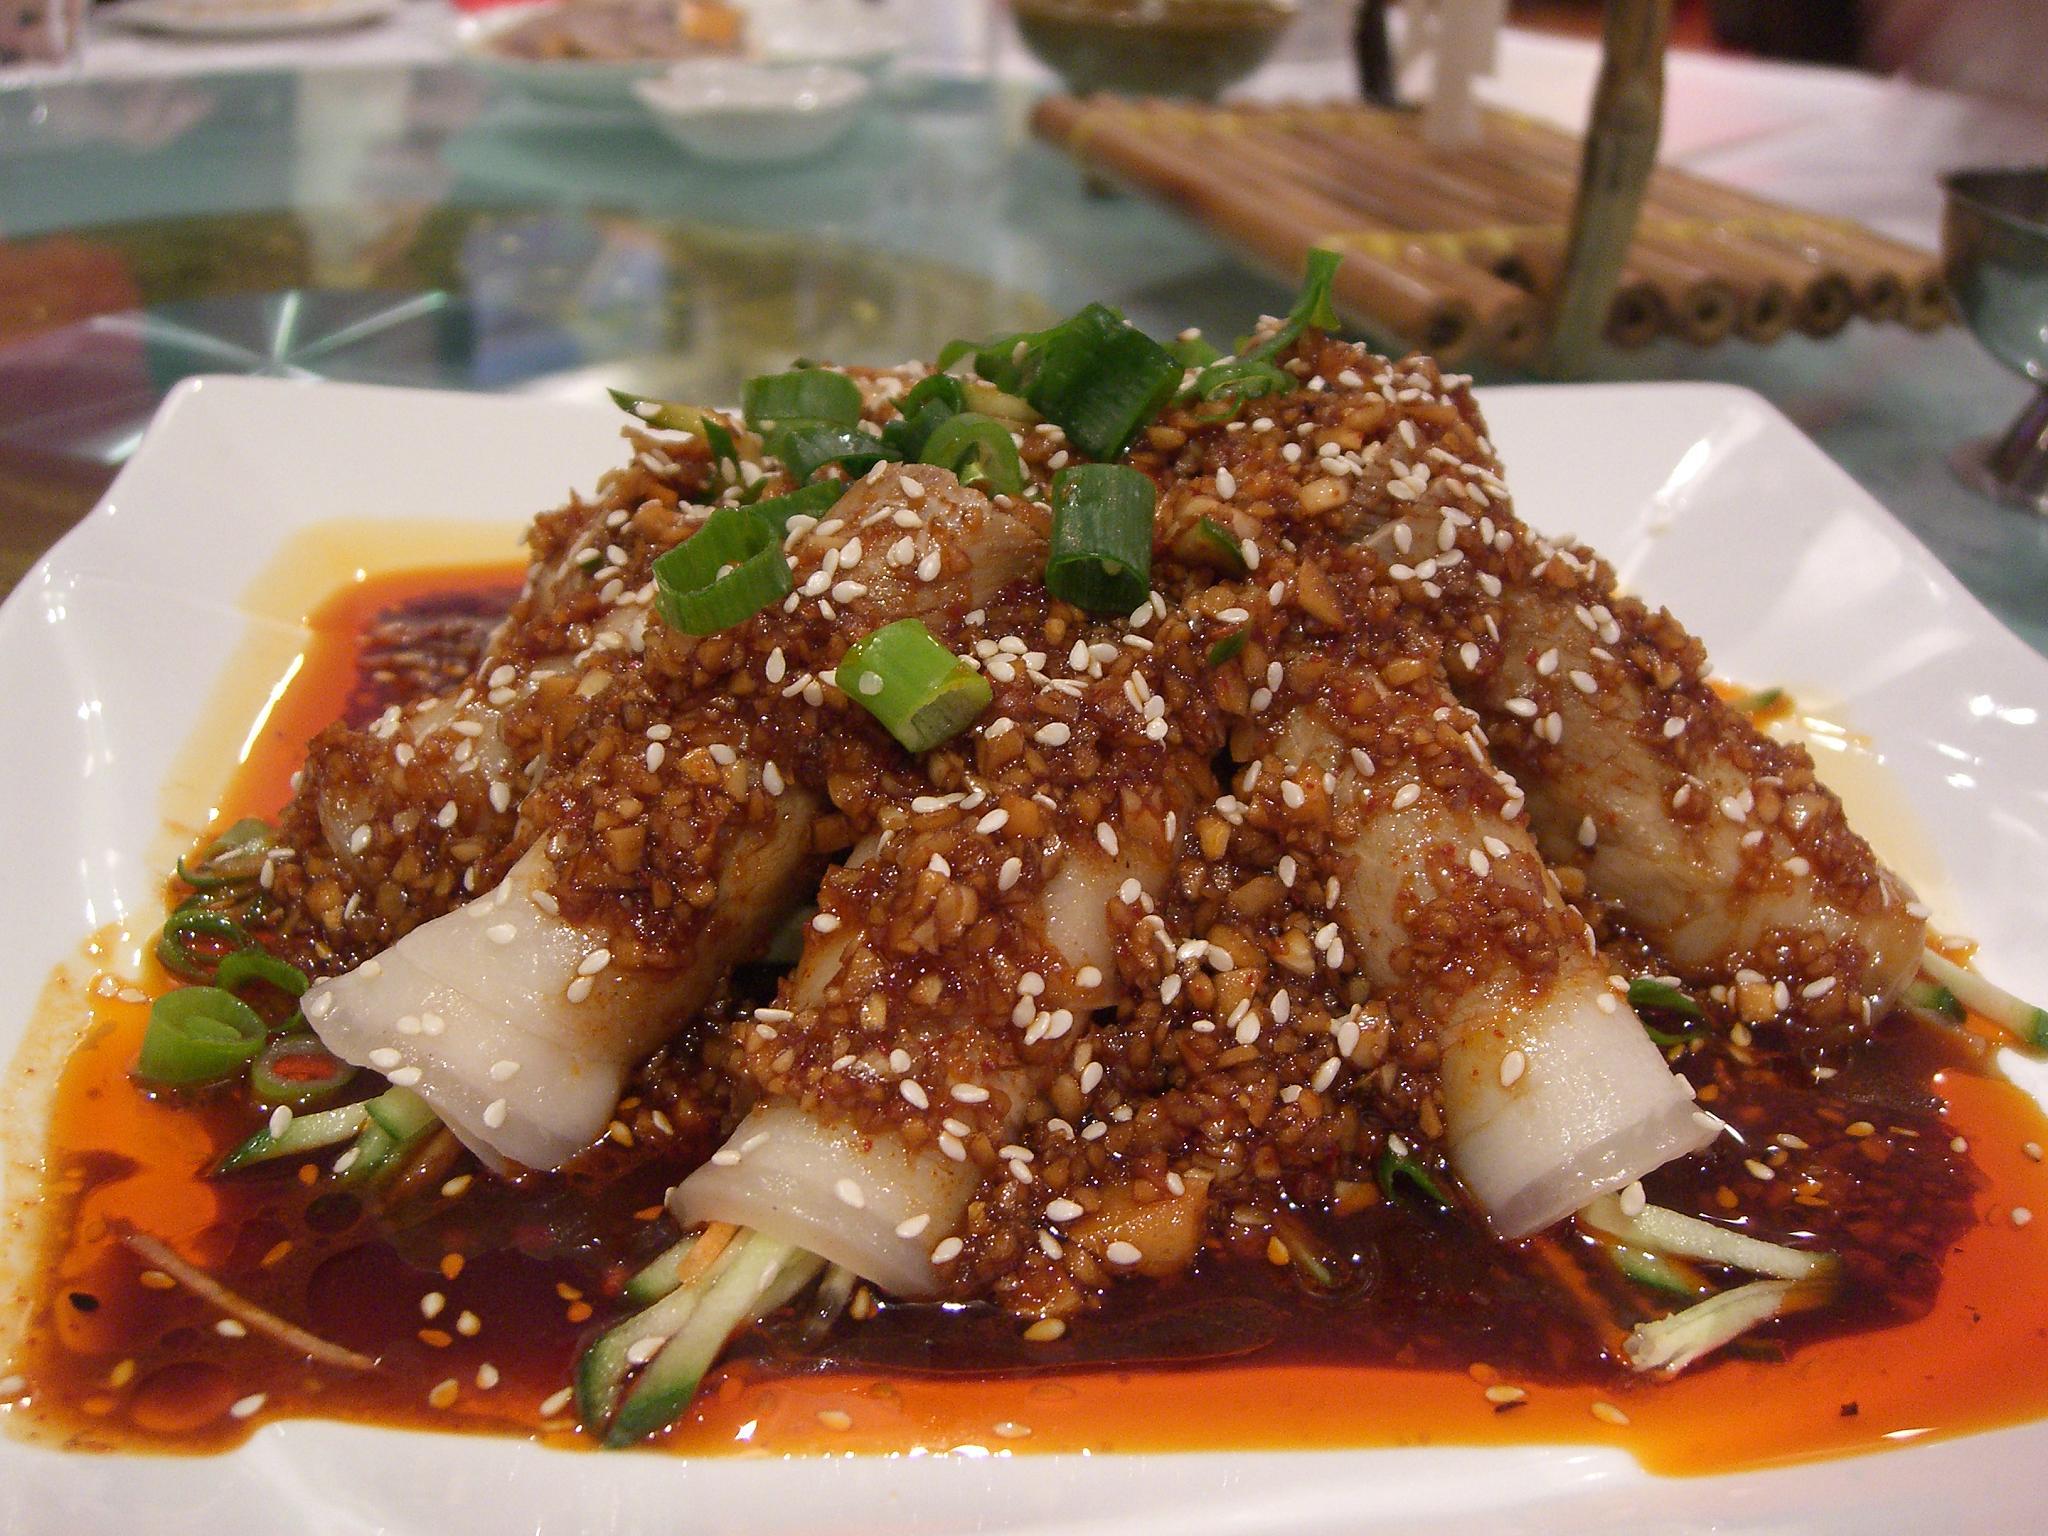 Kitchen Mandarin Kitchen Des Moines Create Custom Trips In 15 Minutes  Mygola Com Mandarin Kitchen Source